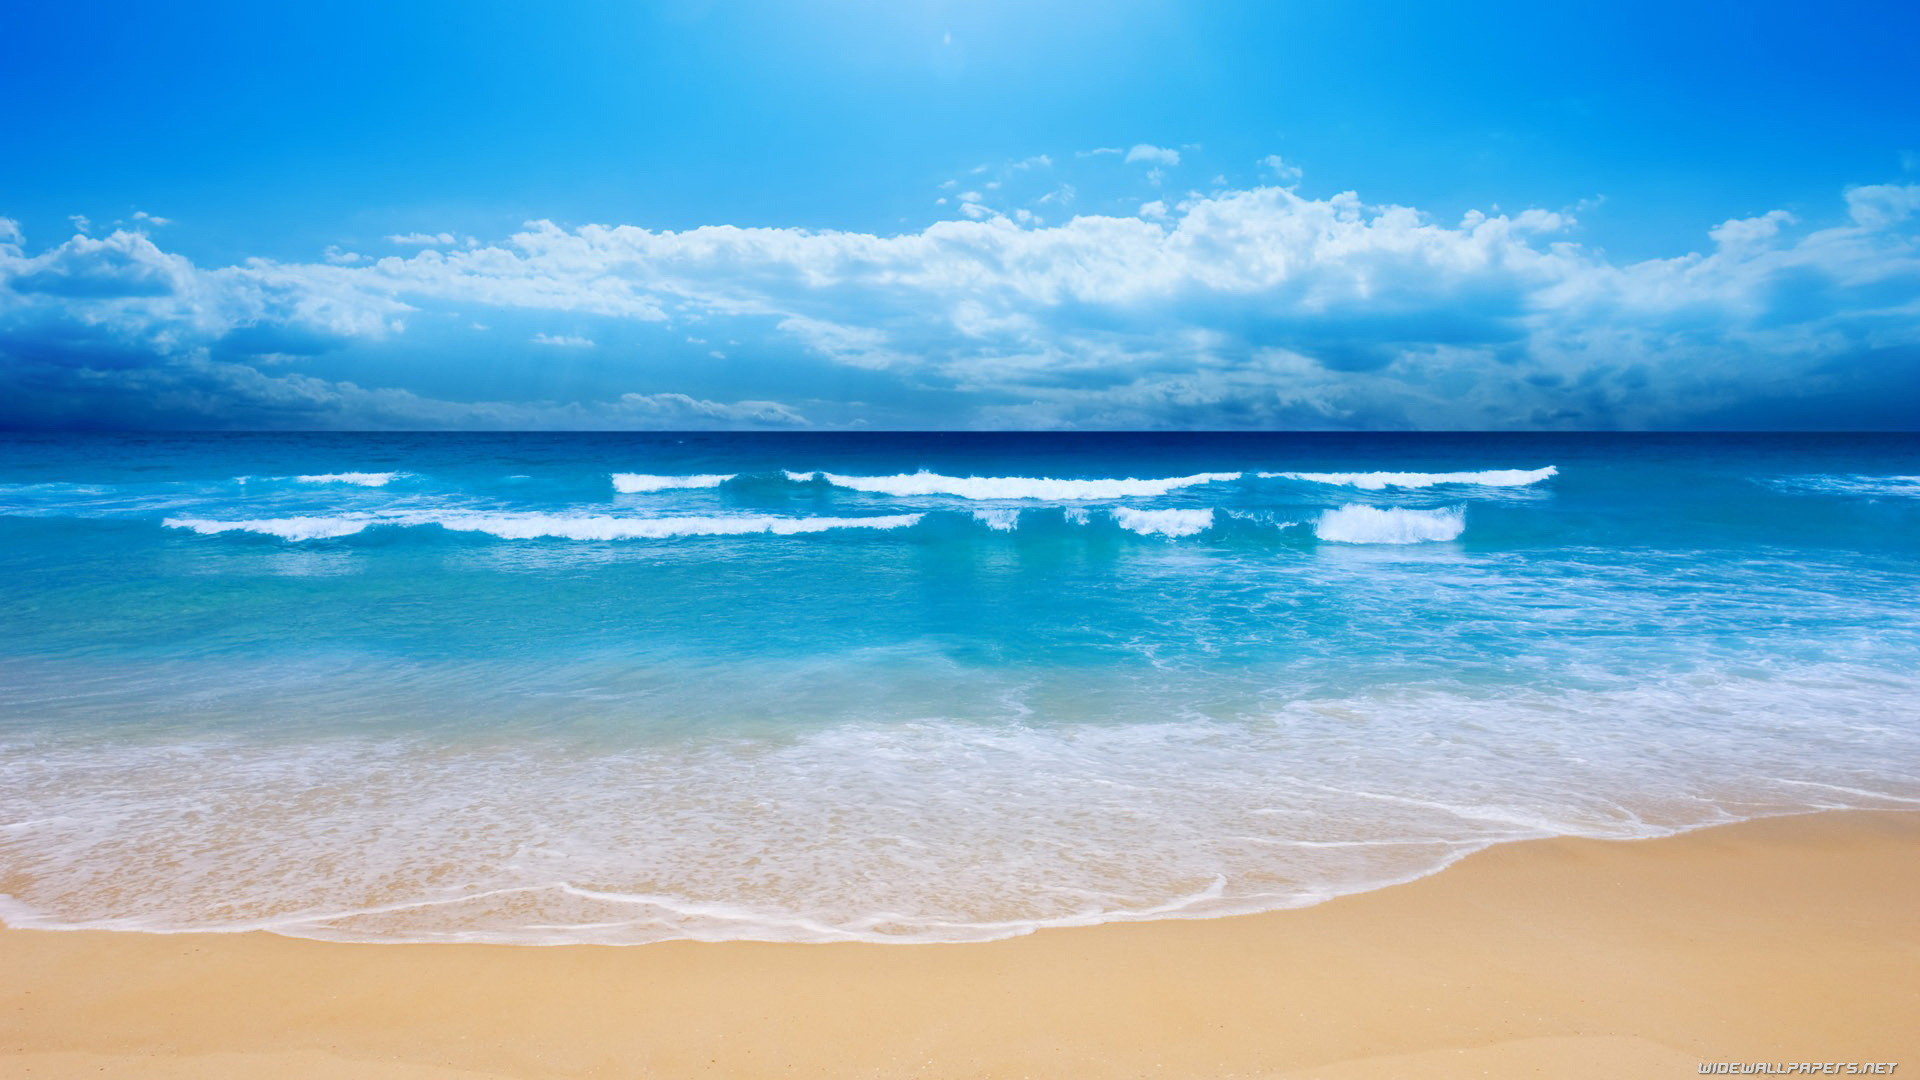 Full HD Beach Wallpaper